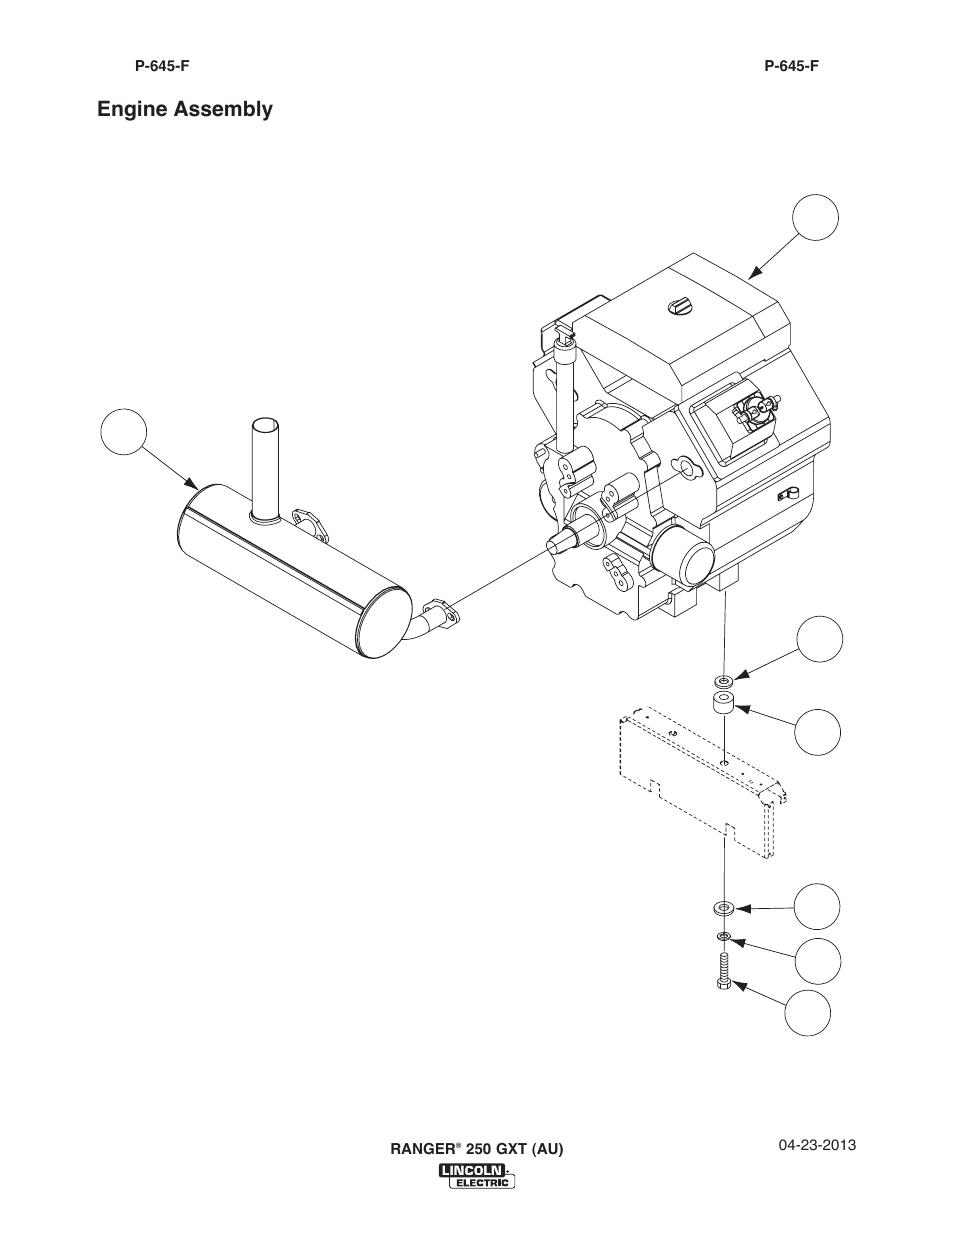 Lincoln Electric IM10052 RANGER 250 GXT (AU) User Manual